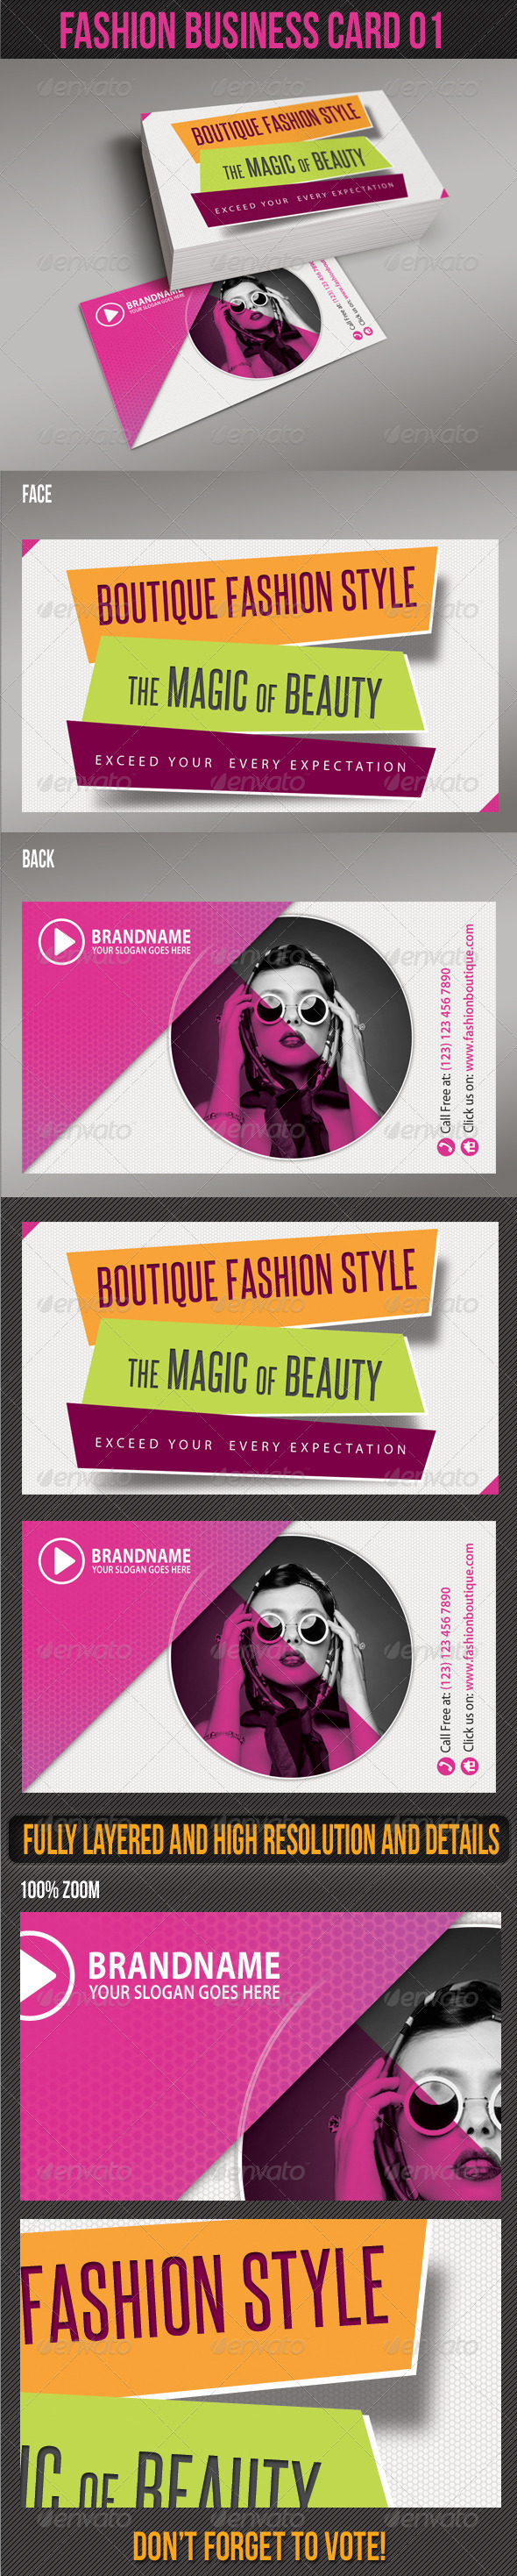 GraphicRiver Fashion Business Card 01 5629217